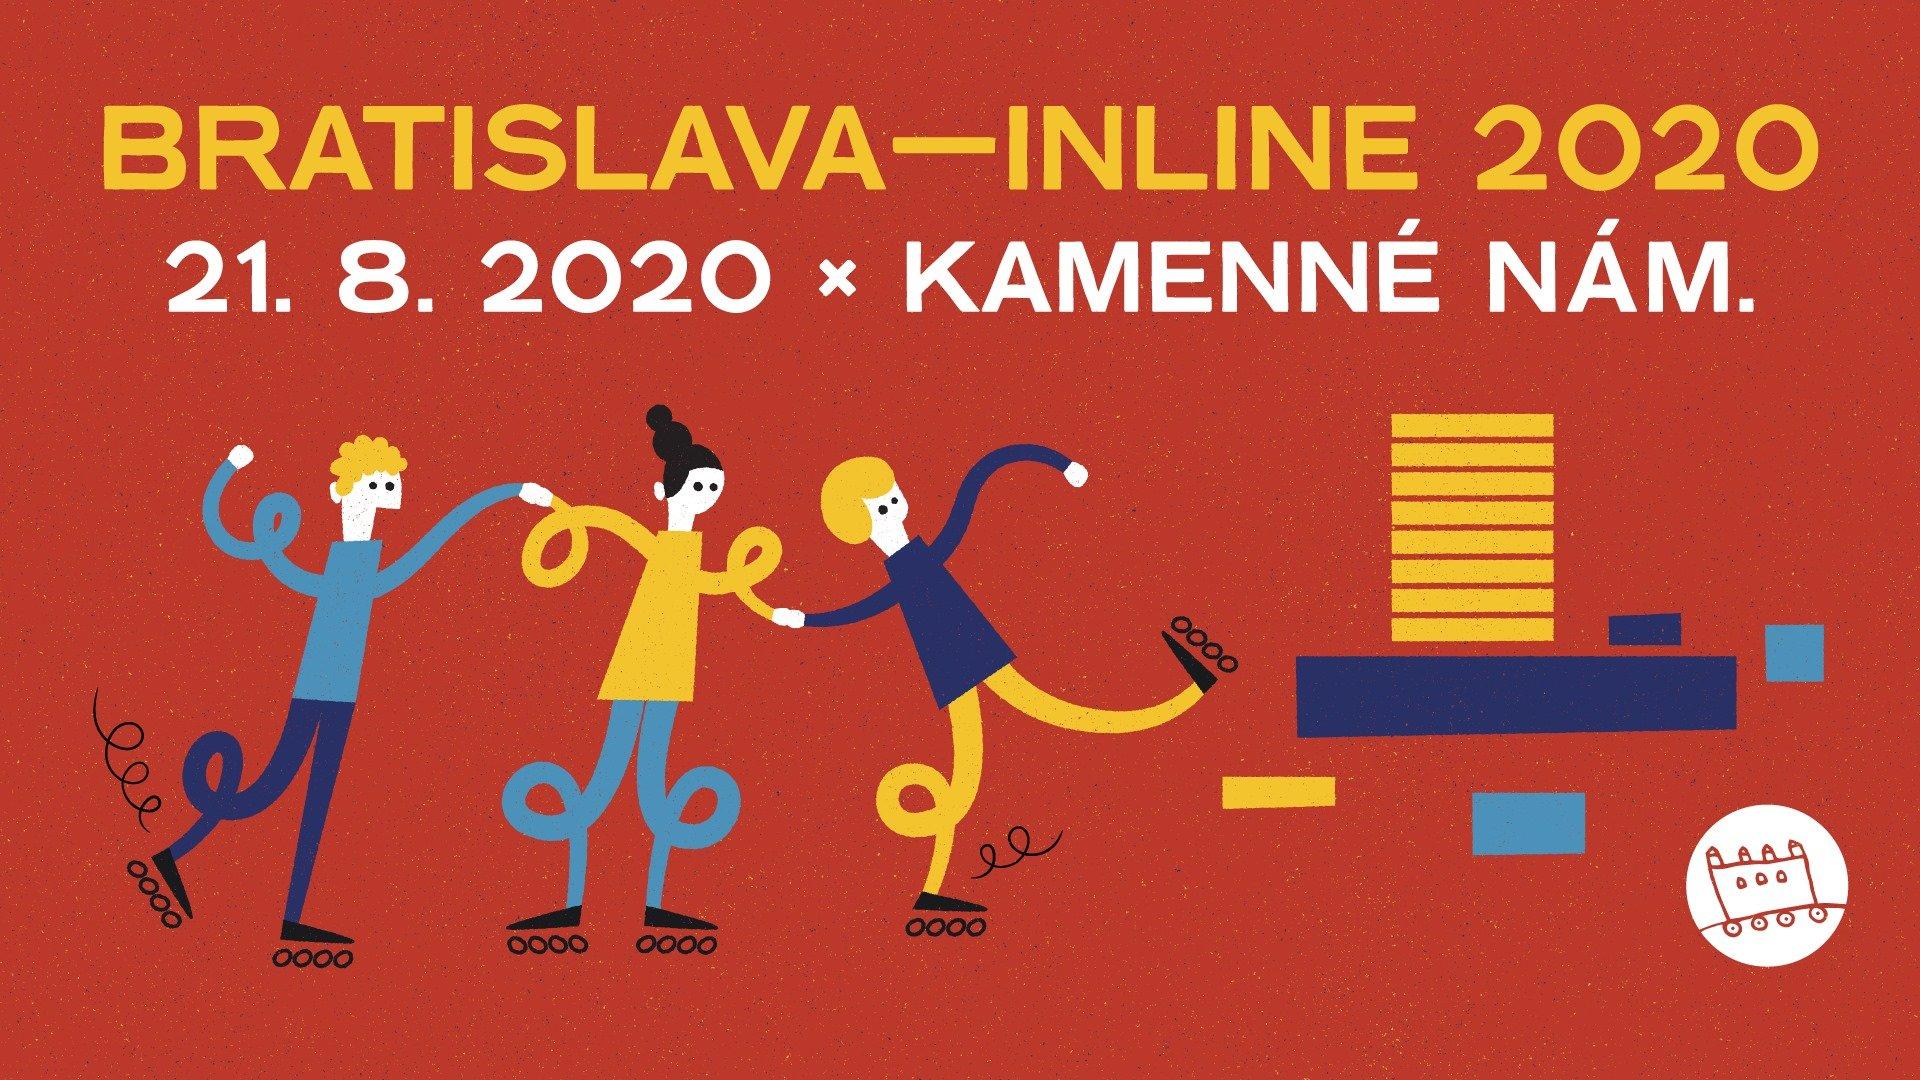 Bratislava-inline August